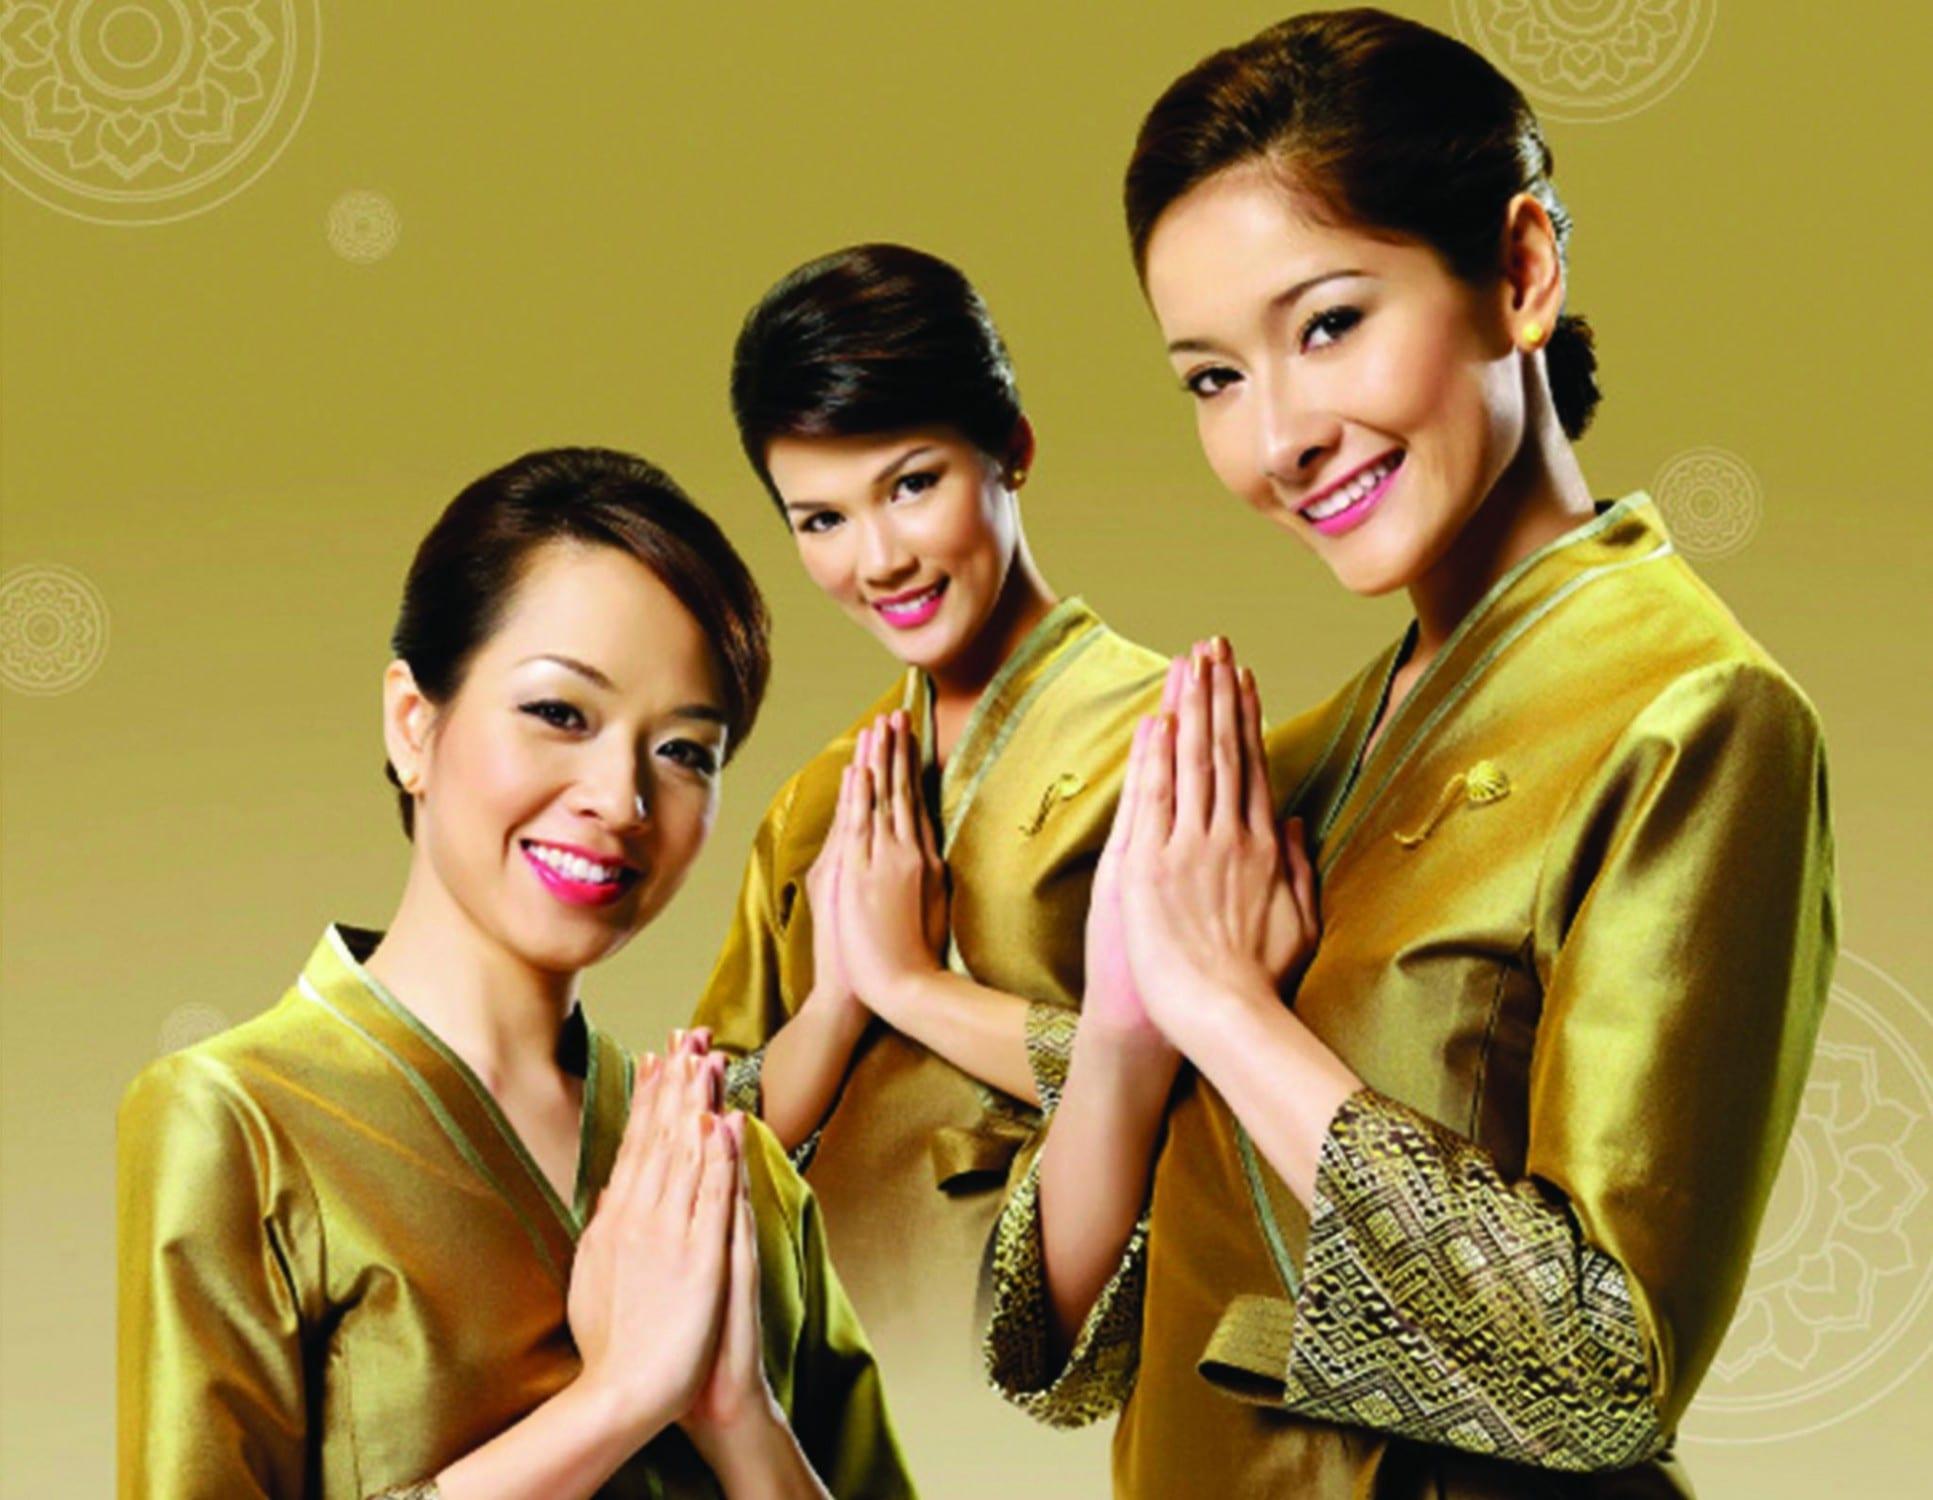 Thailand Elite